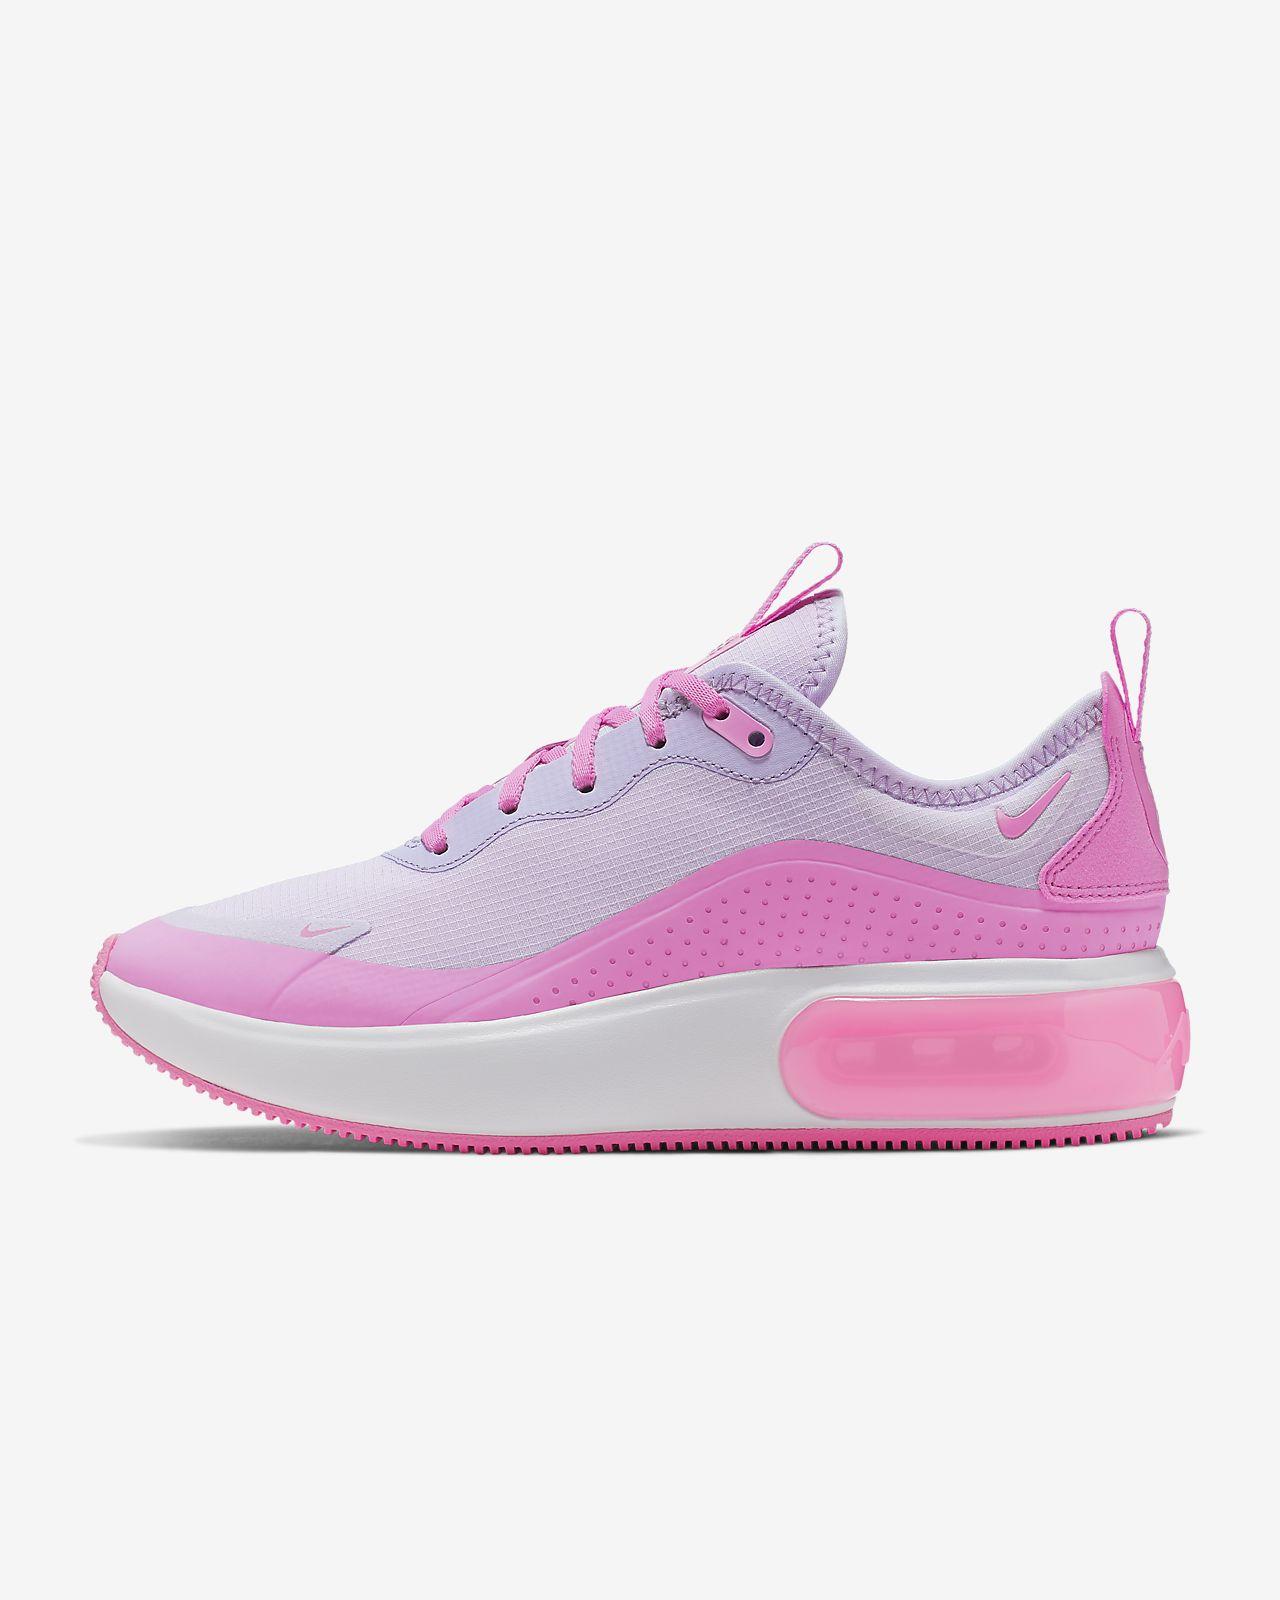 Nike Air Max Dia cipő